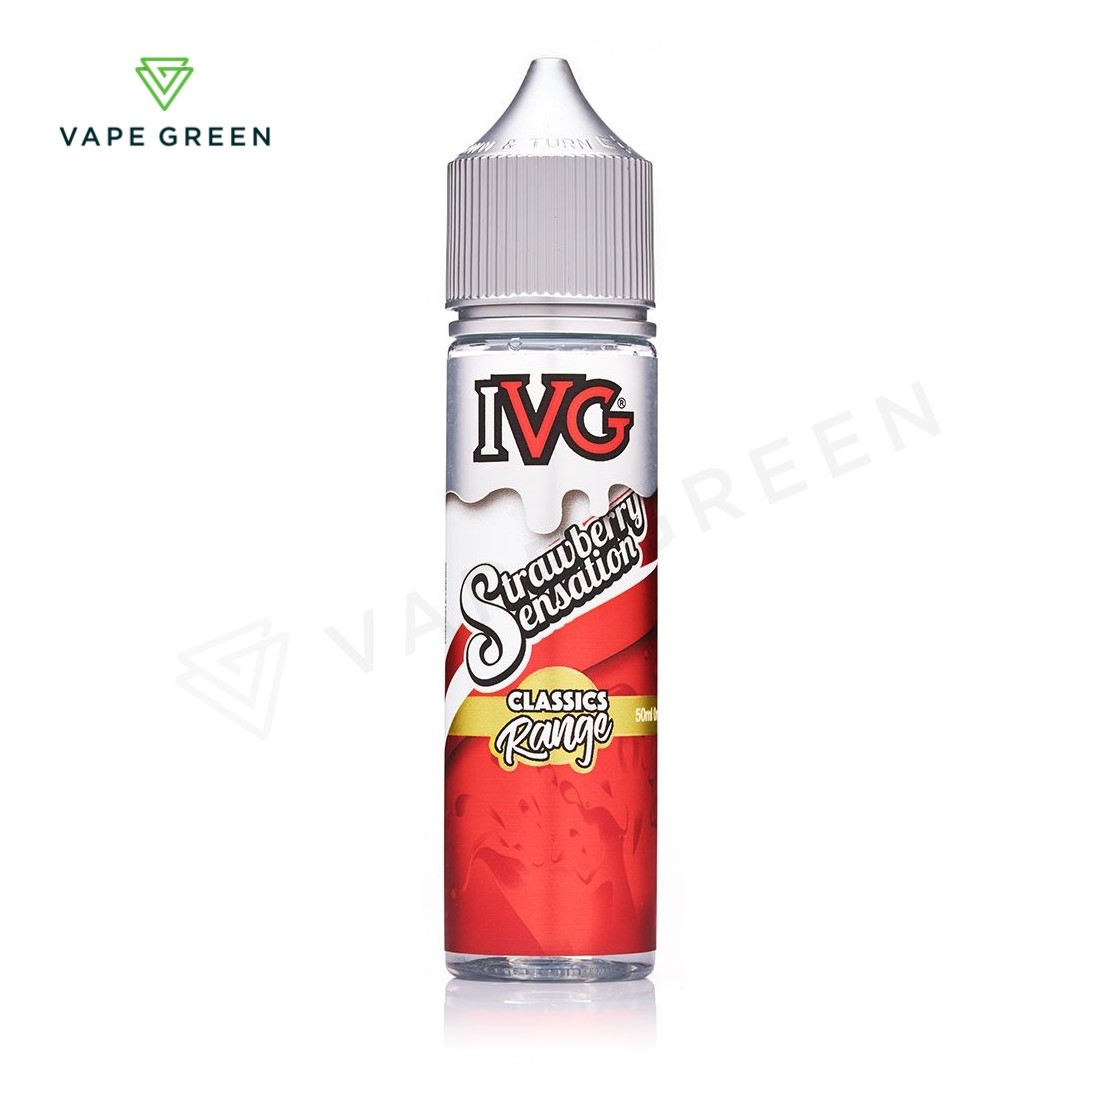 Strawberry Sensation E-liquid by IVG Classics 50ml